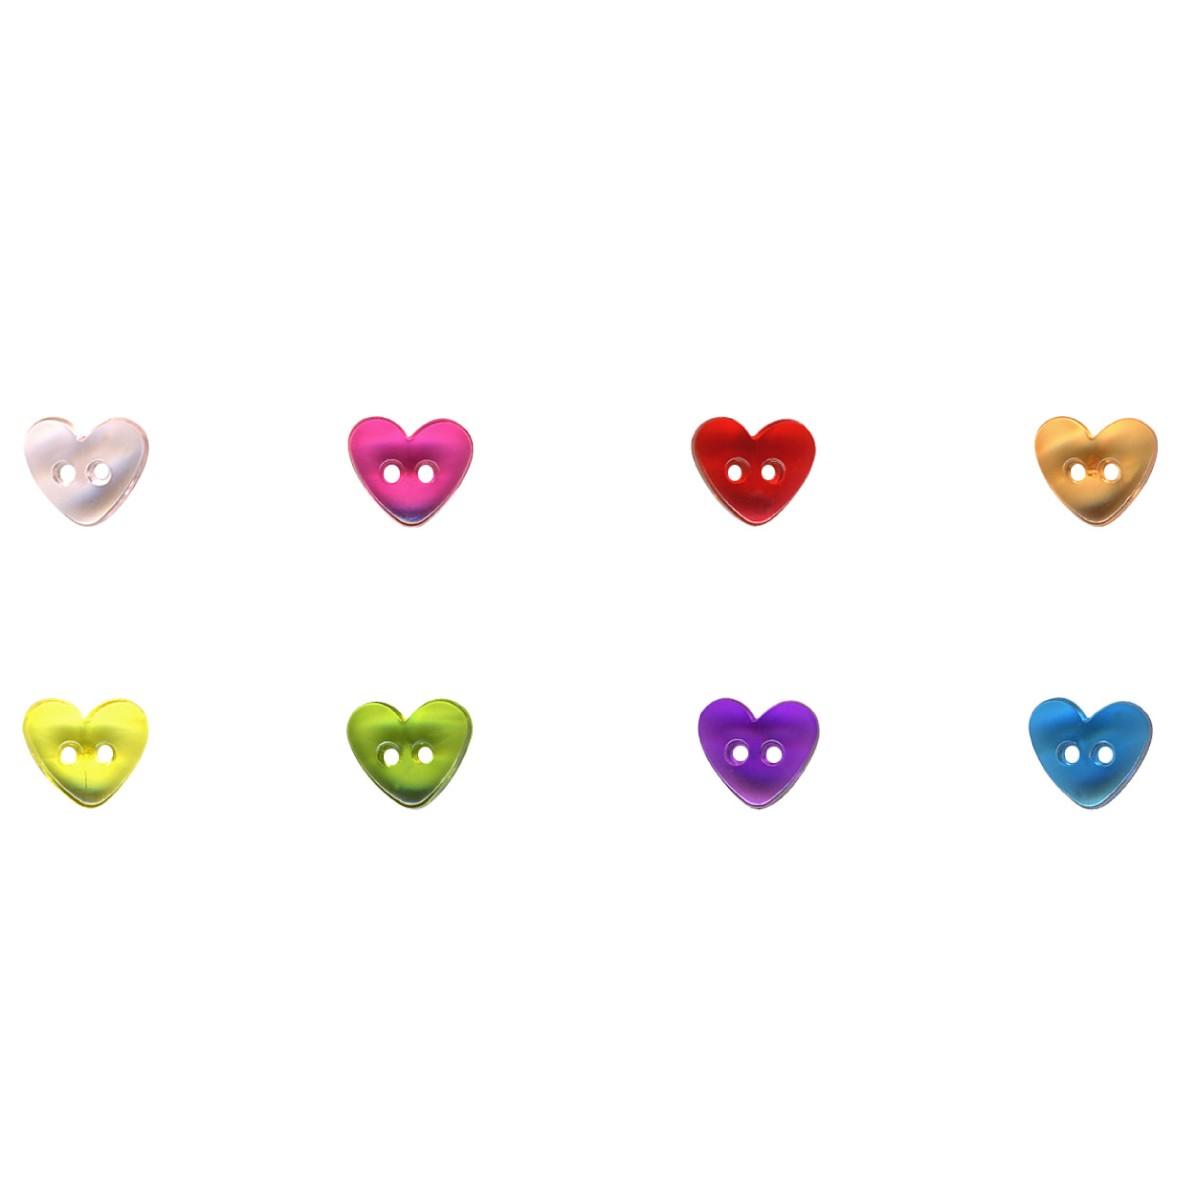 transparent heart button - Stéphanoise et Médiac